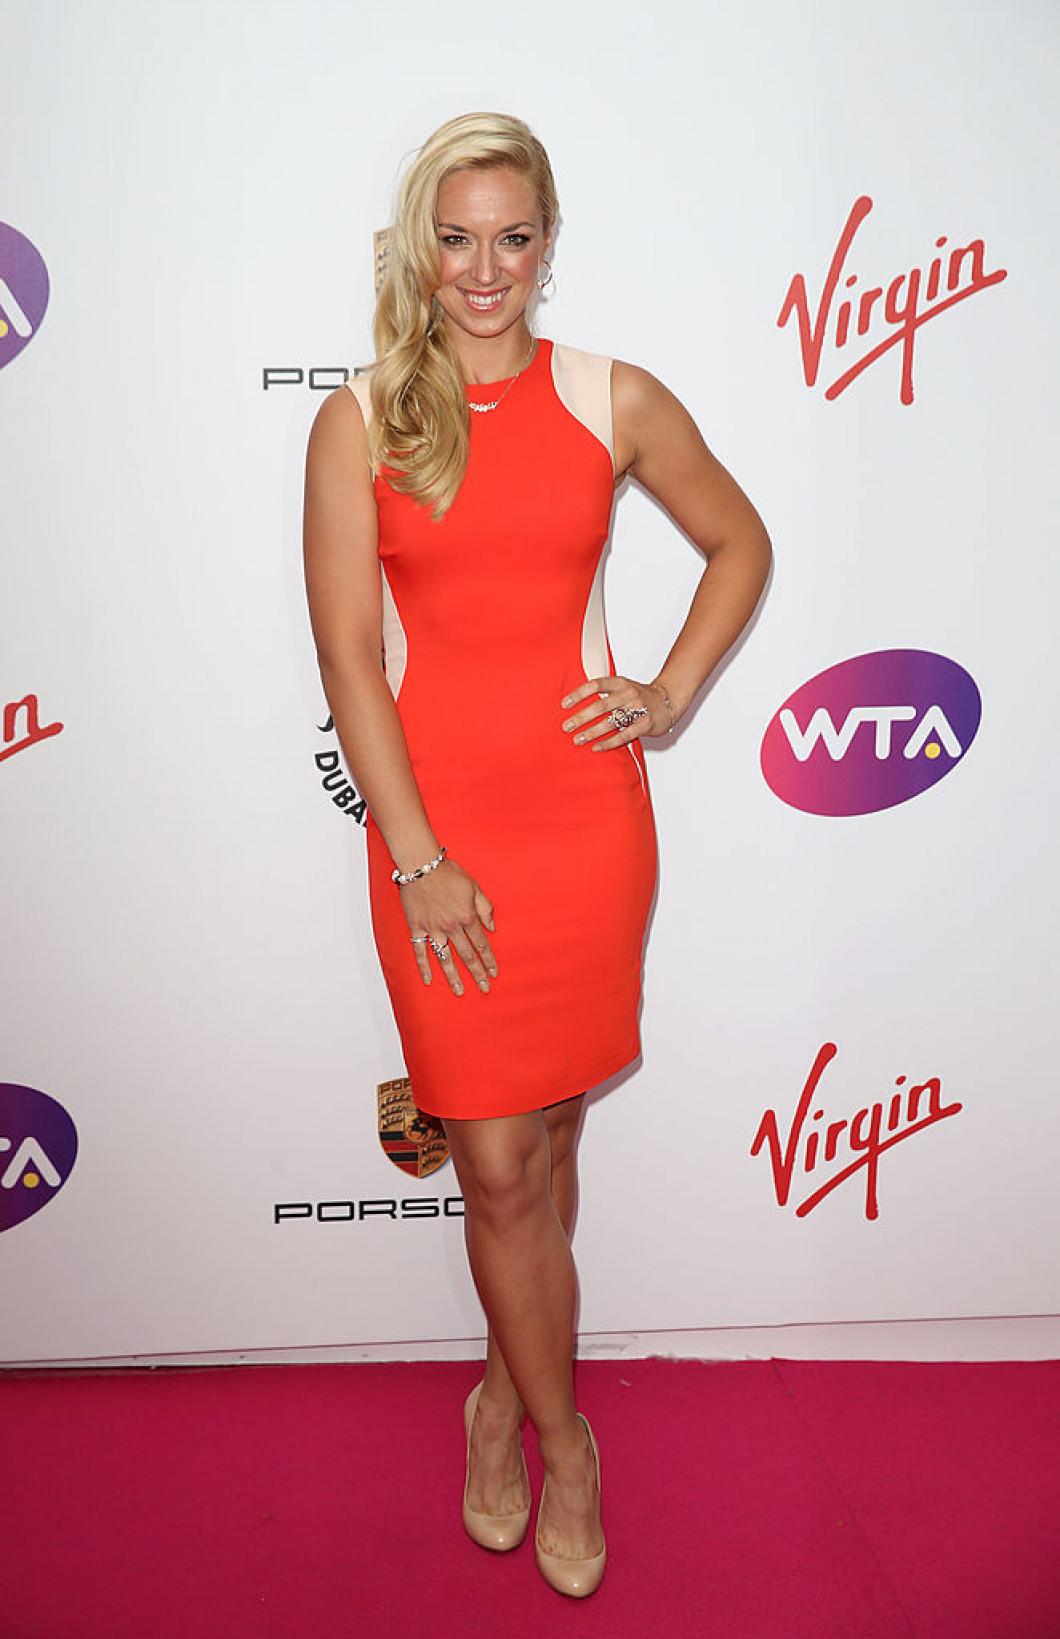 WTA Pre-Wimbledon Party - Red Carpet Arrivals